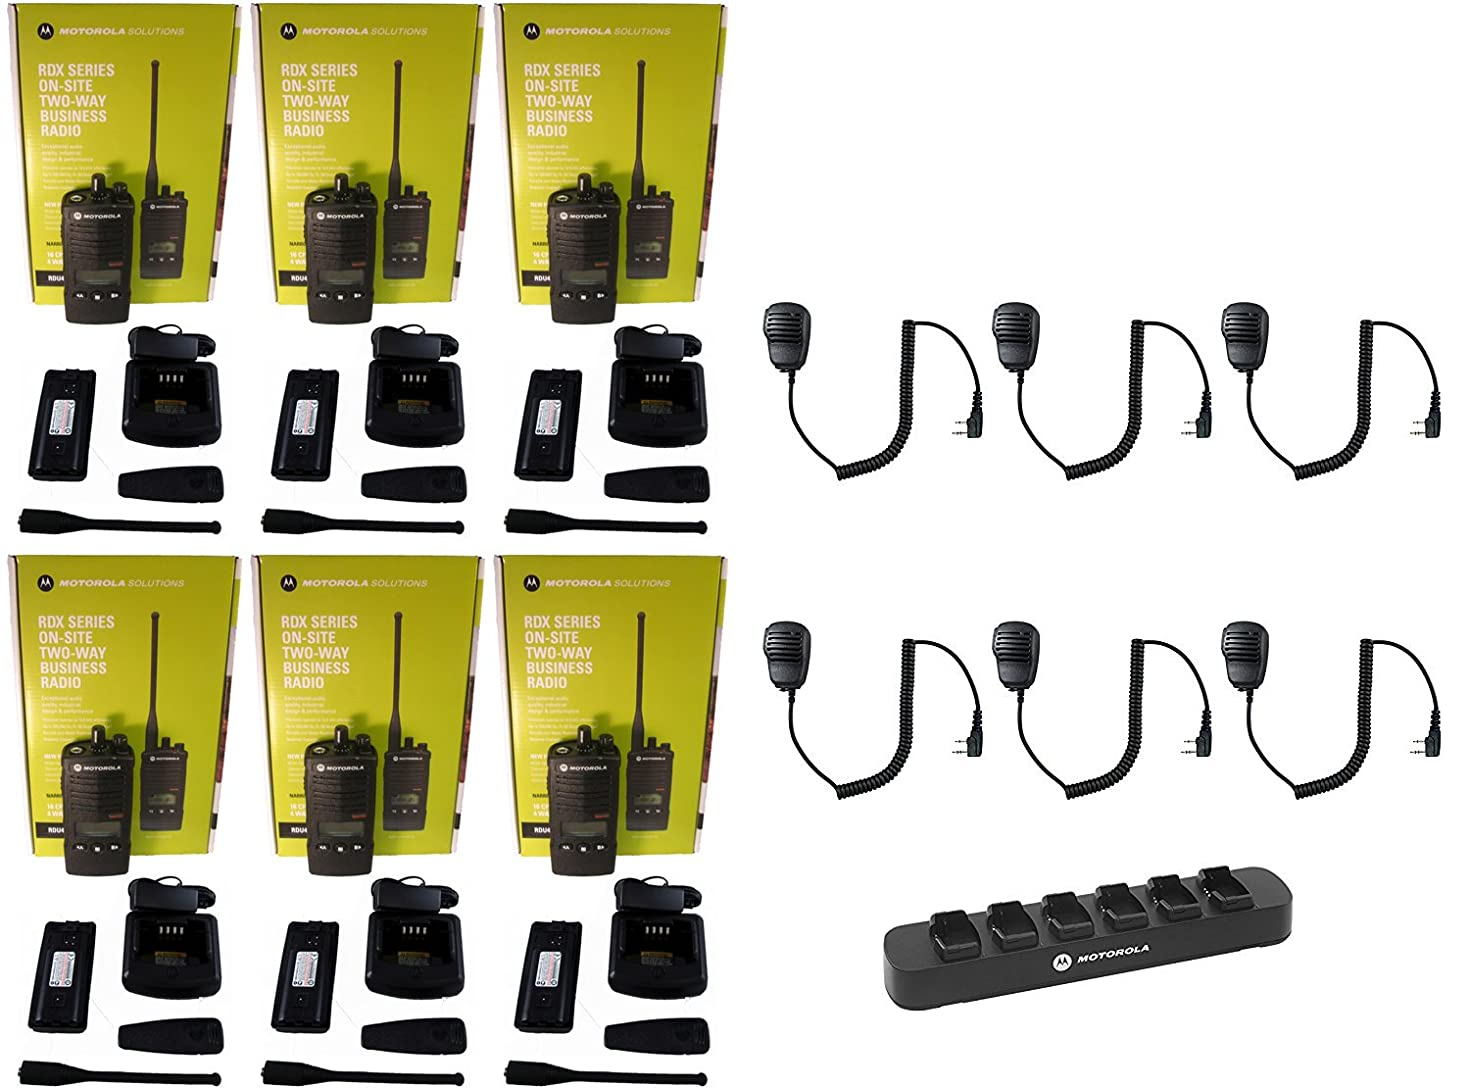 QTY 6 Motorola RDU4160D UHF 4 watt 16 channel radio and QTY 6 Speaker Microphone and QTY 1 Motorola RLN6309 Multi-Unit Gang Charger